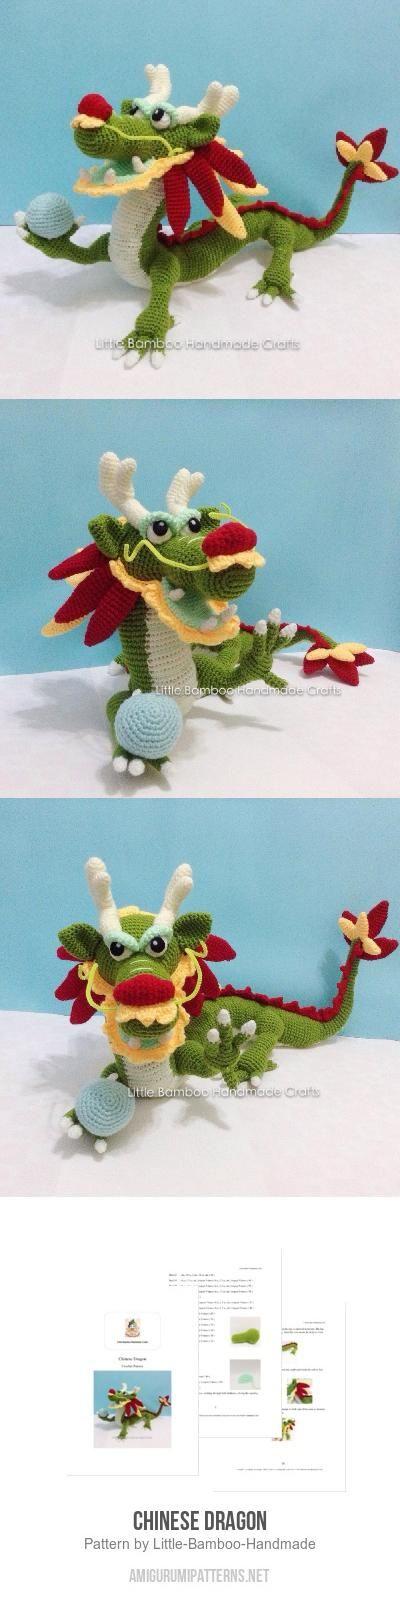 Chinese dragon amigurumi pattern by Little Bamboo Handmade | Drachen ...